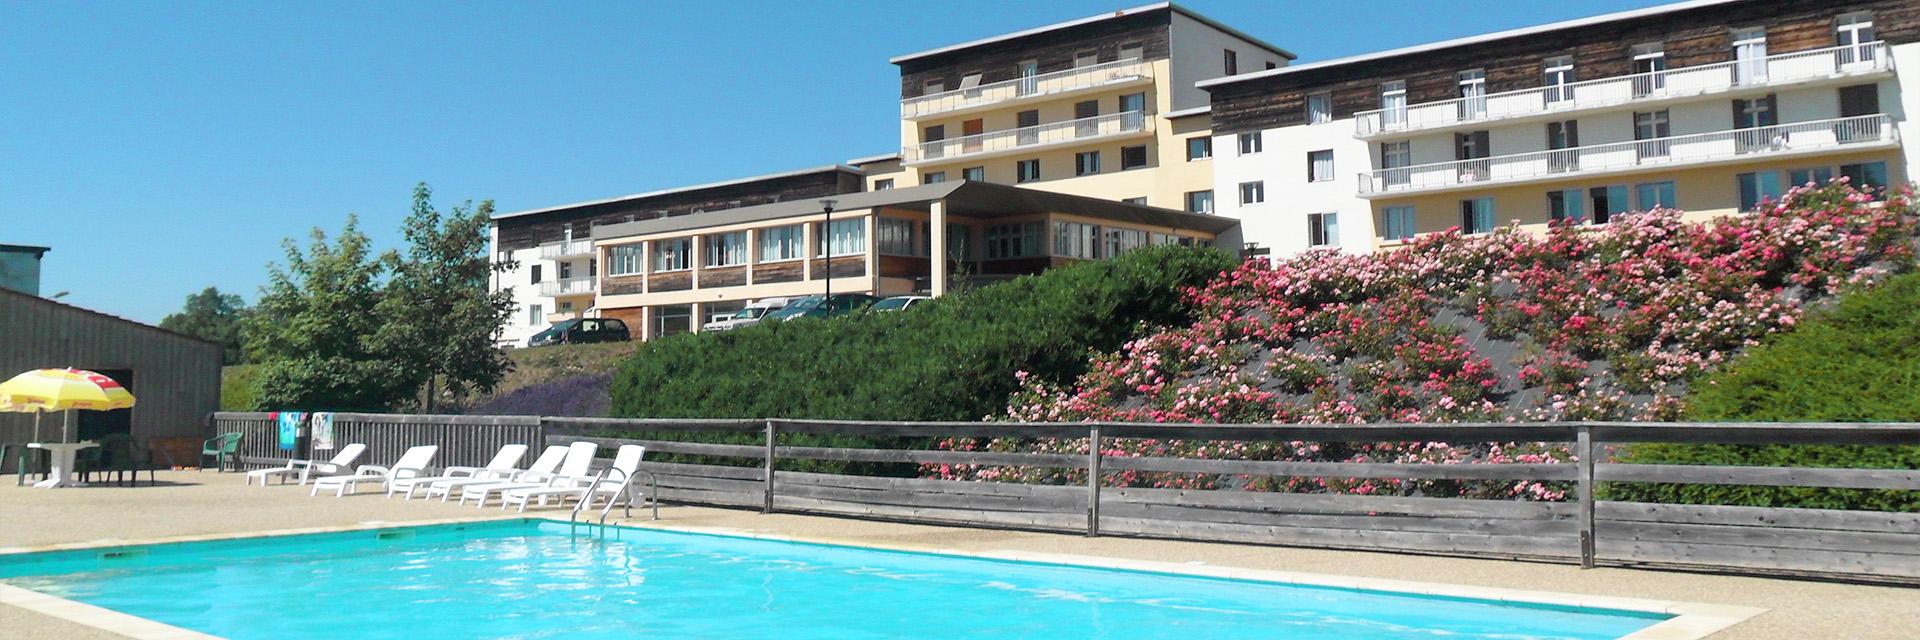 Village_club_vacances_aveyron-cantal-ardèche-fleurs-aubrac-village-piscine